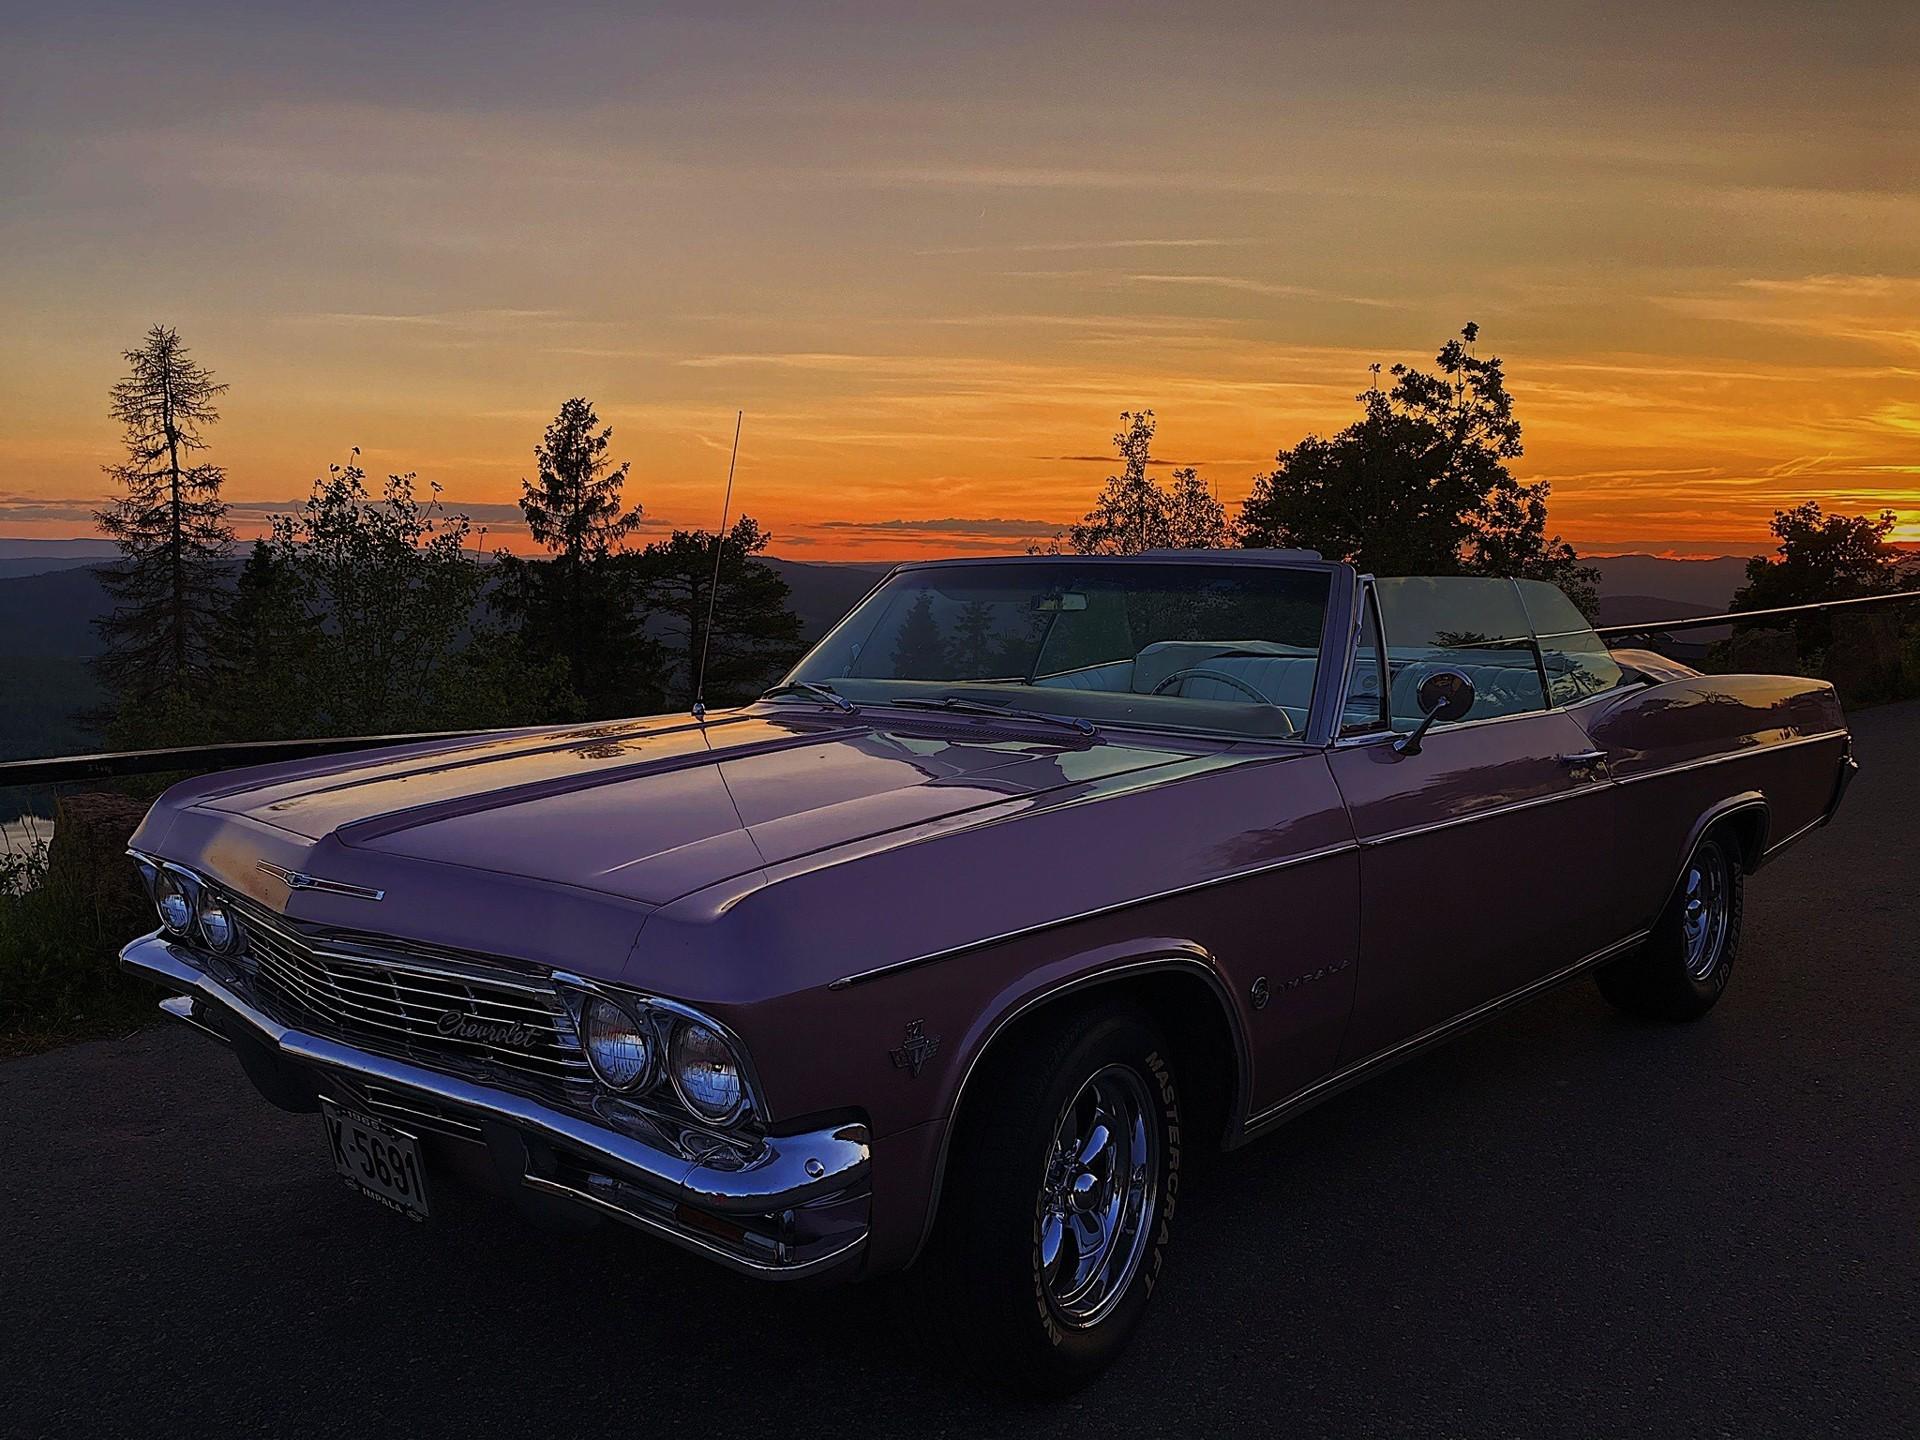 316-1965 Chevrolet Impala convertible 01. Eiere- m